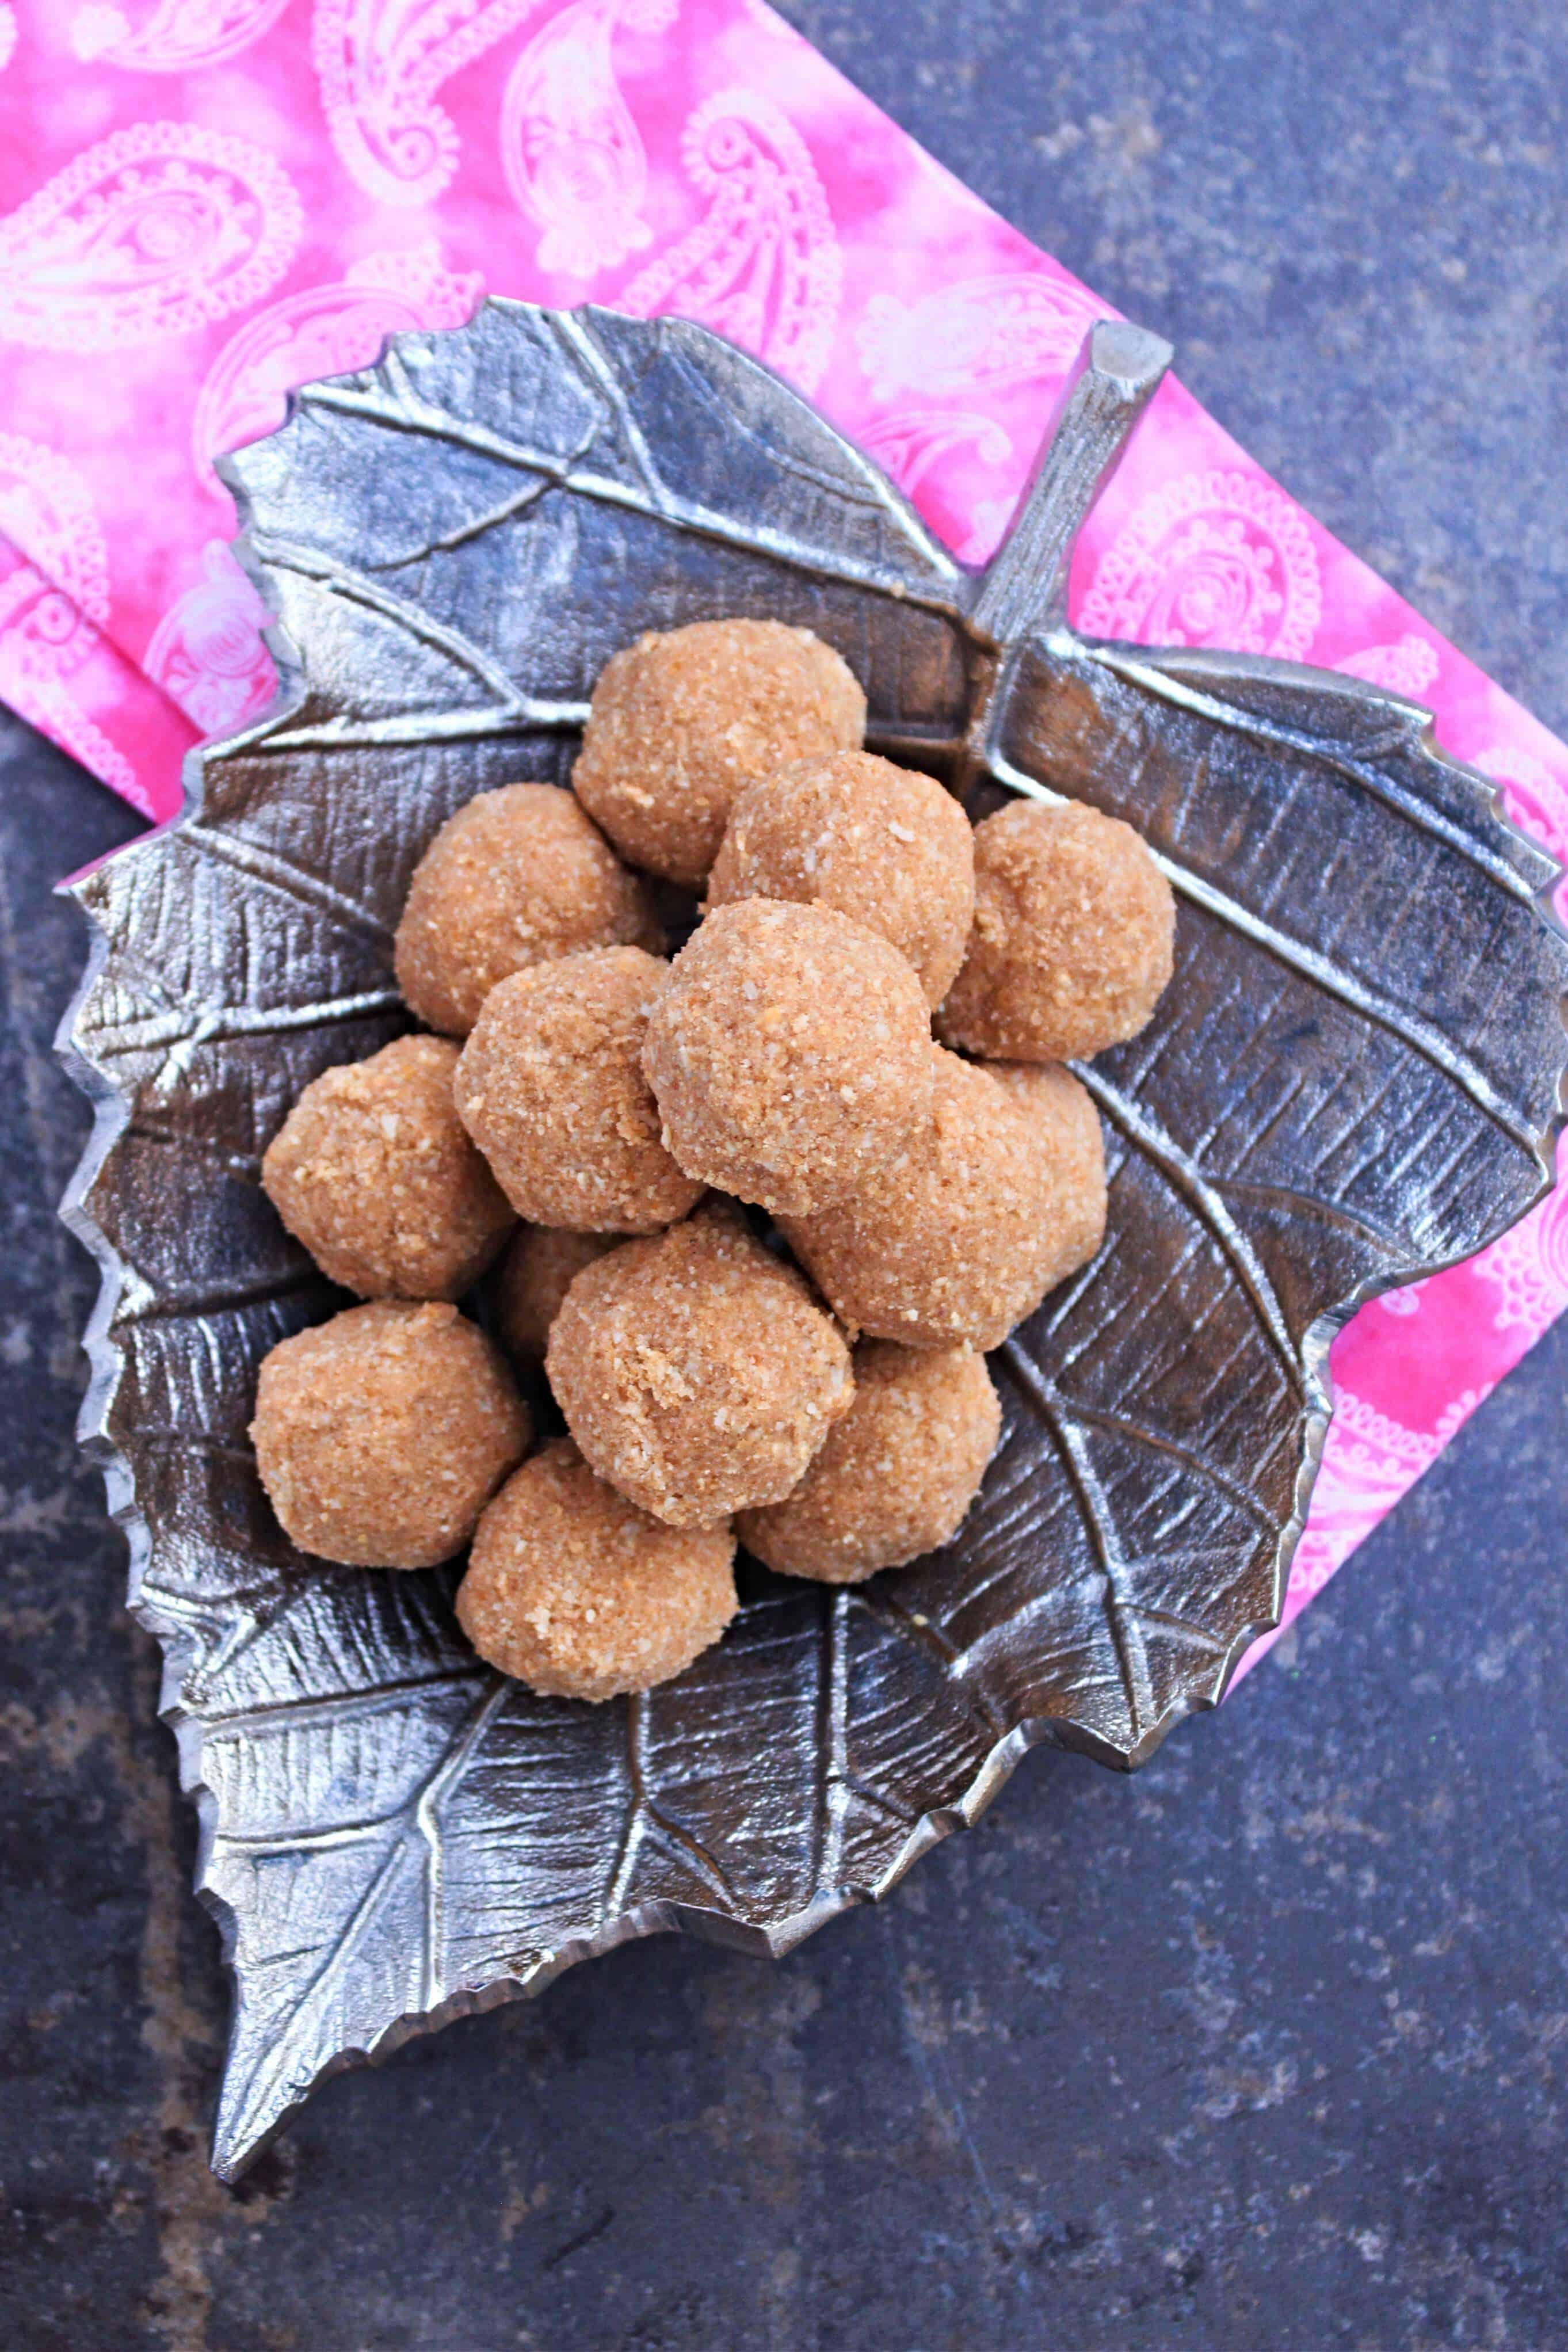 Kerala Style Cashew Rice Balls on a decorative plate